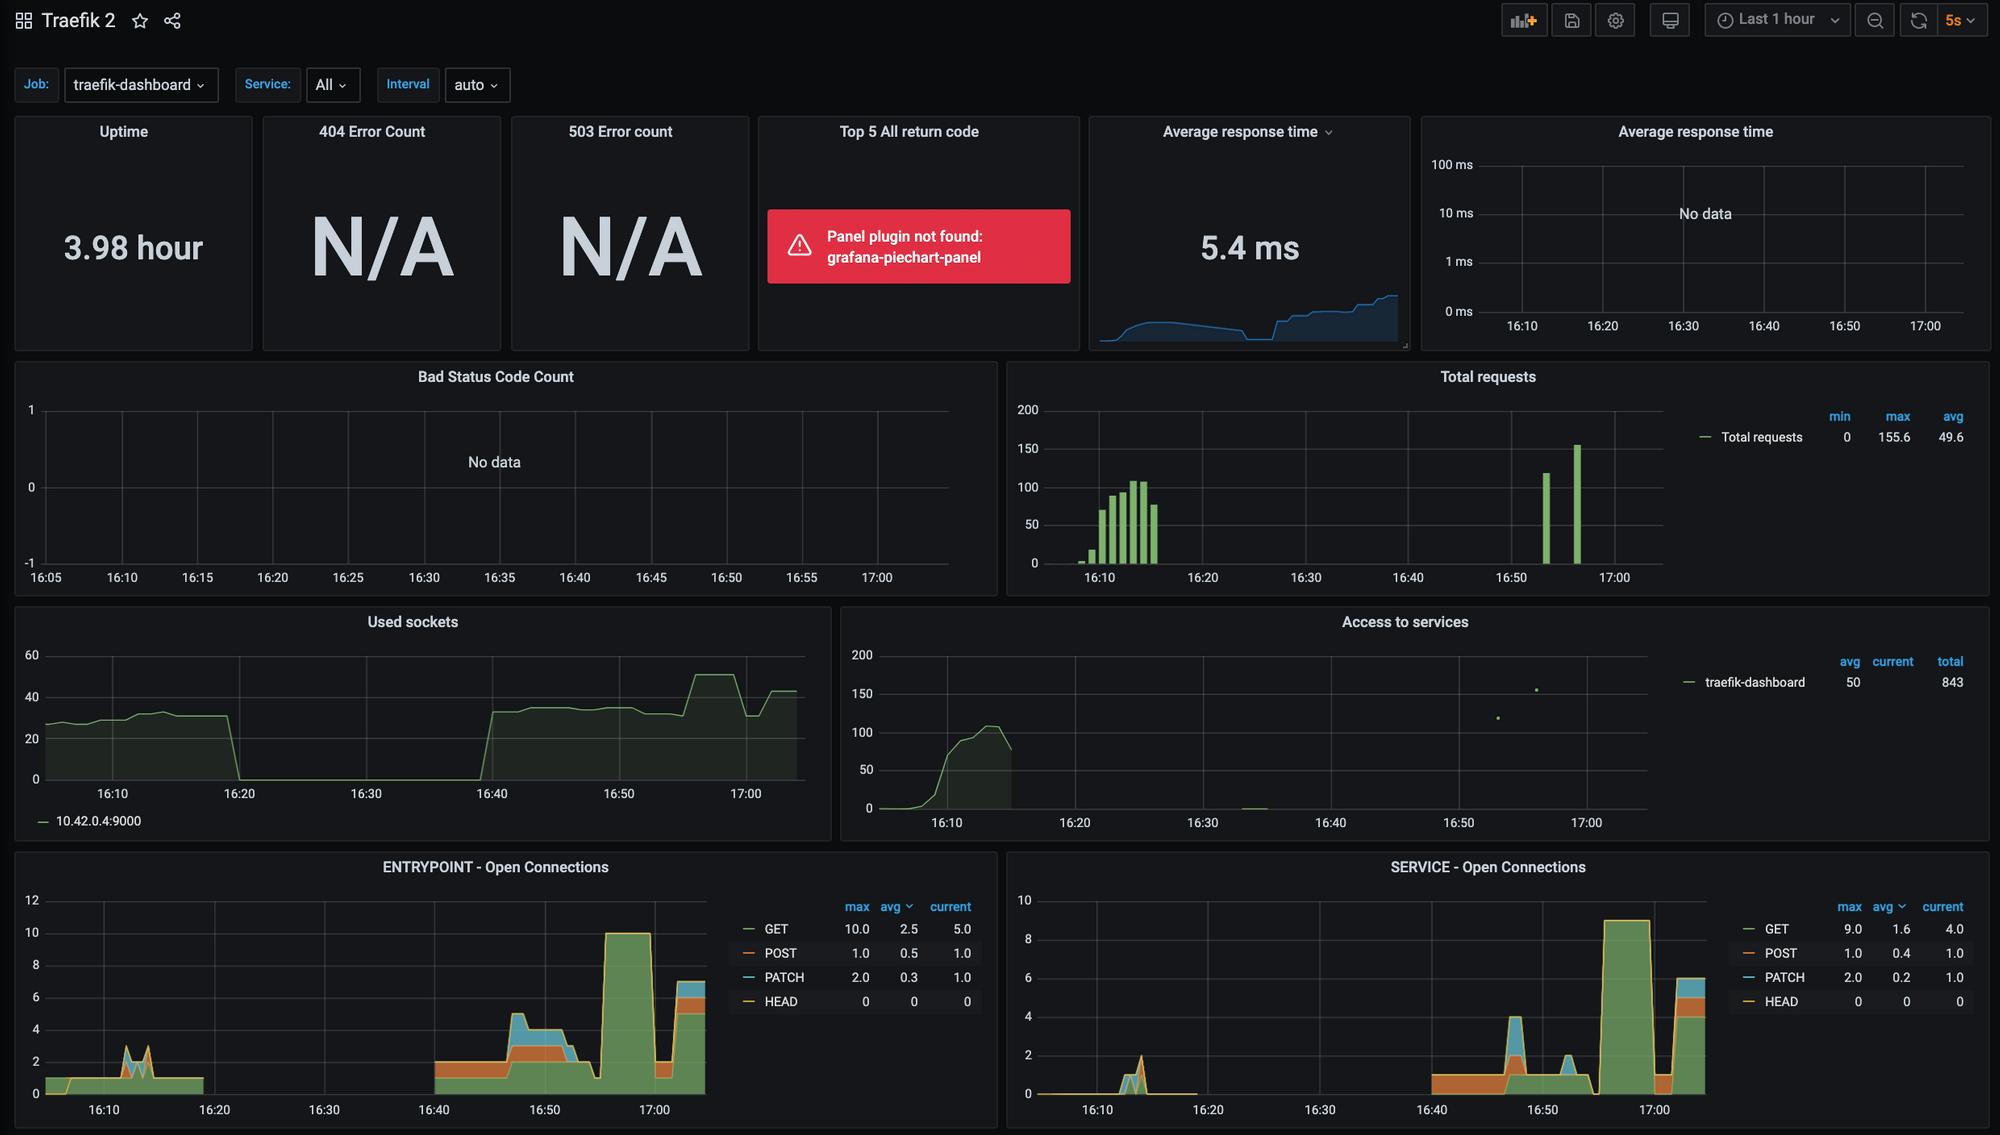 Screenshot of Grafana Traefik 2 dashboard showing rich data